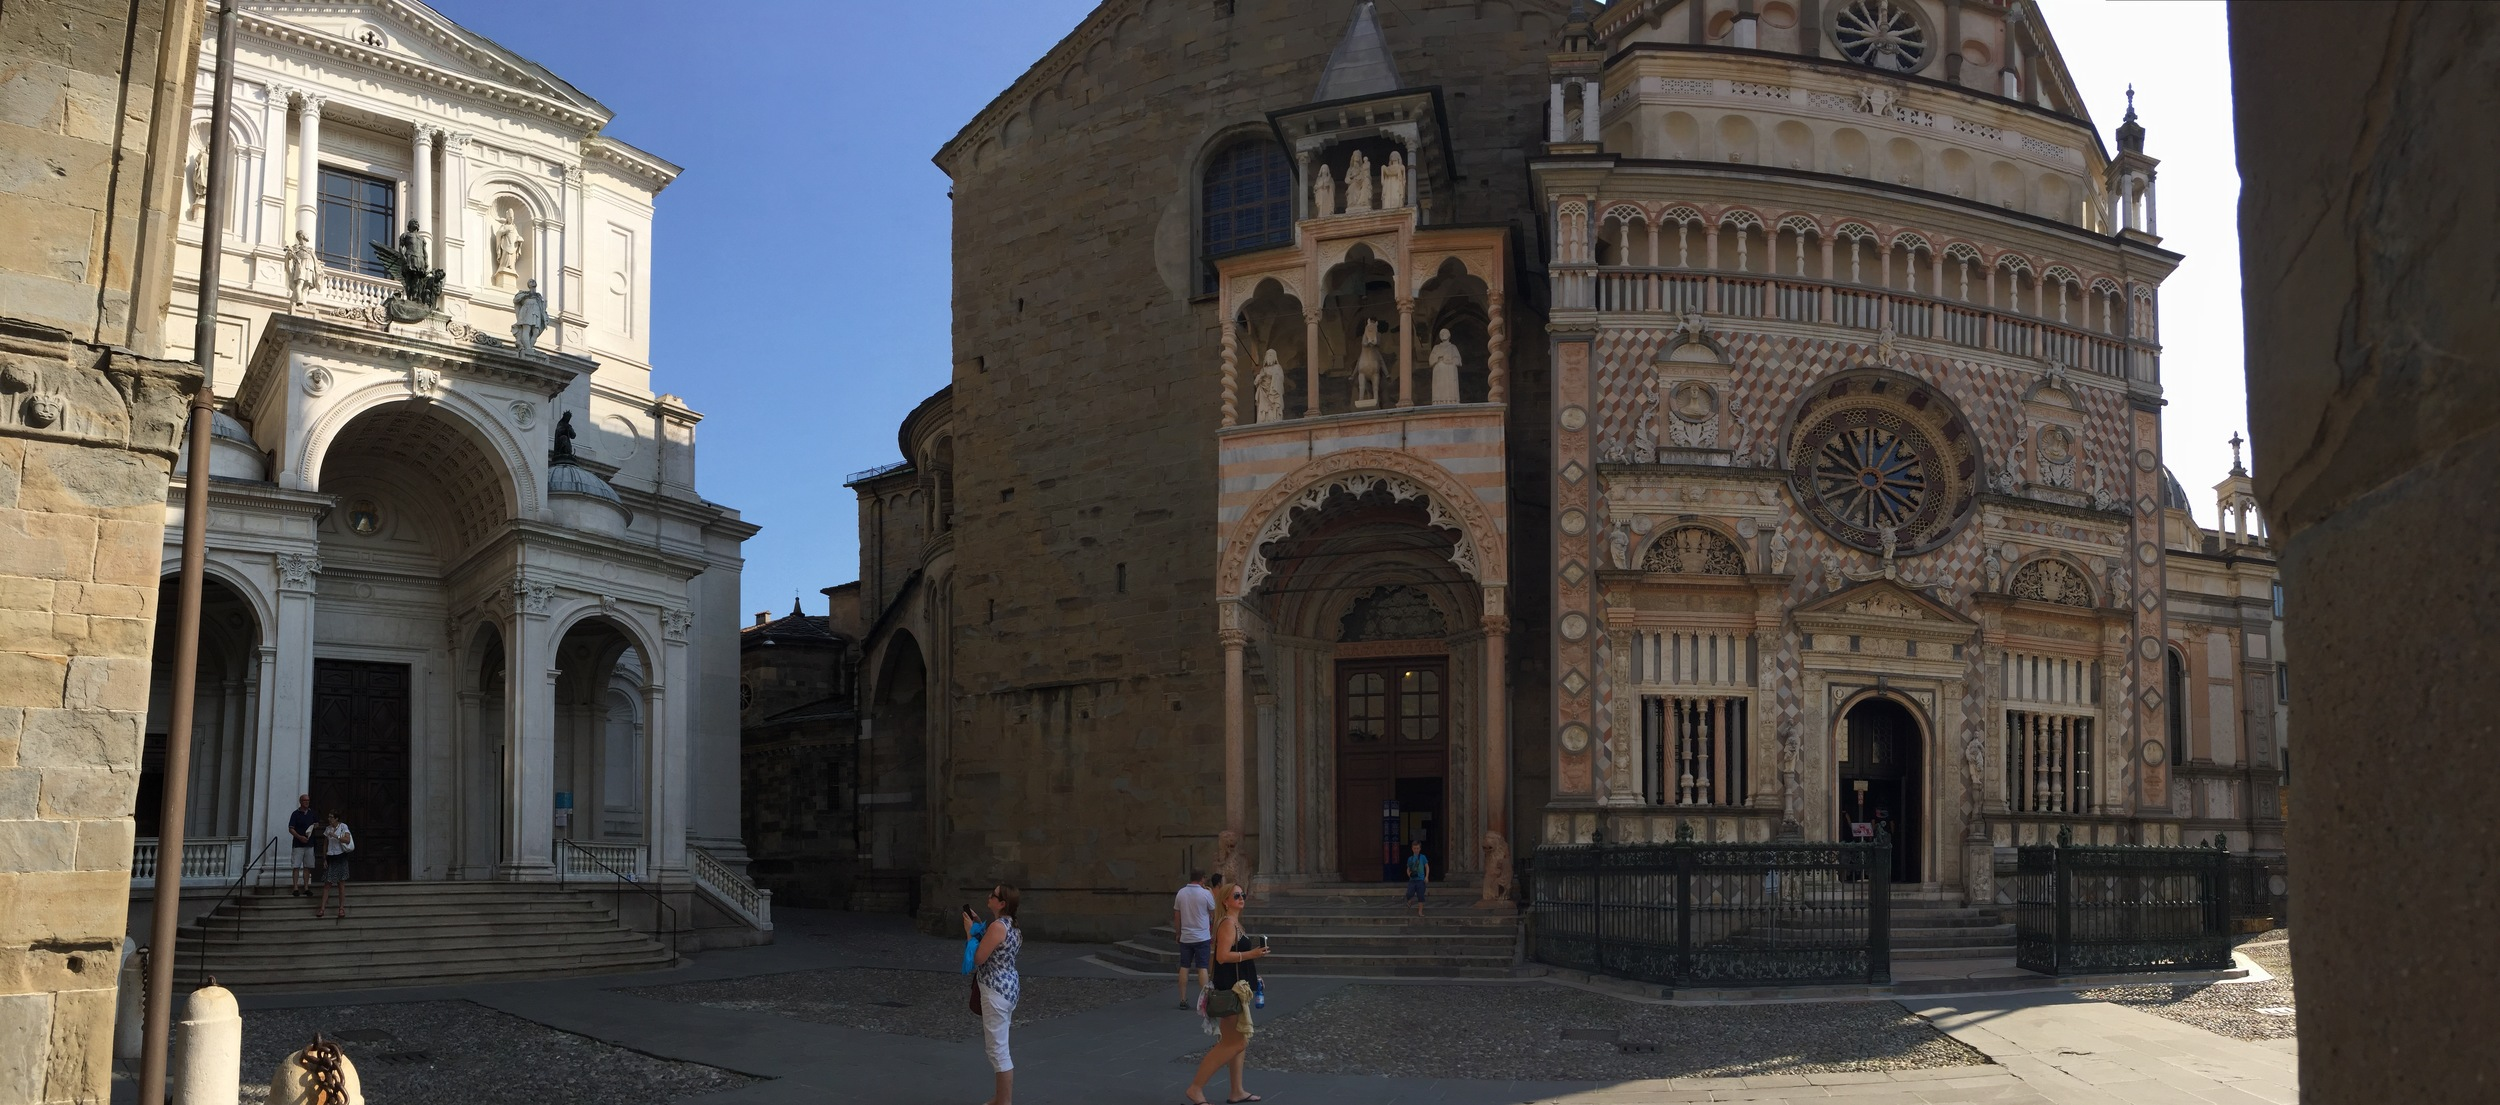 Bergamo, land of elaborate churches